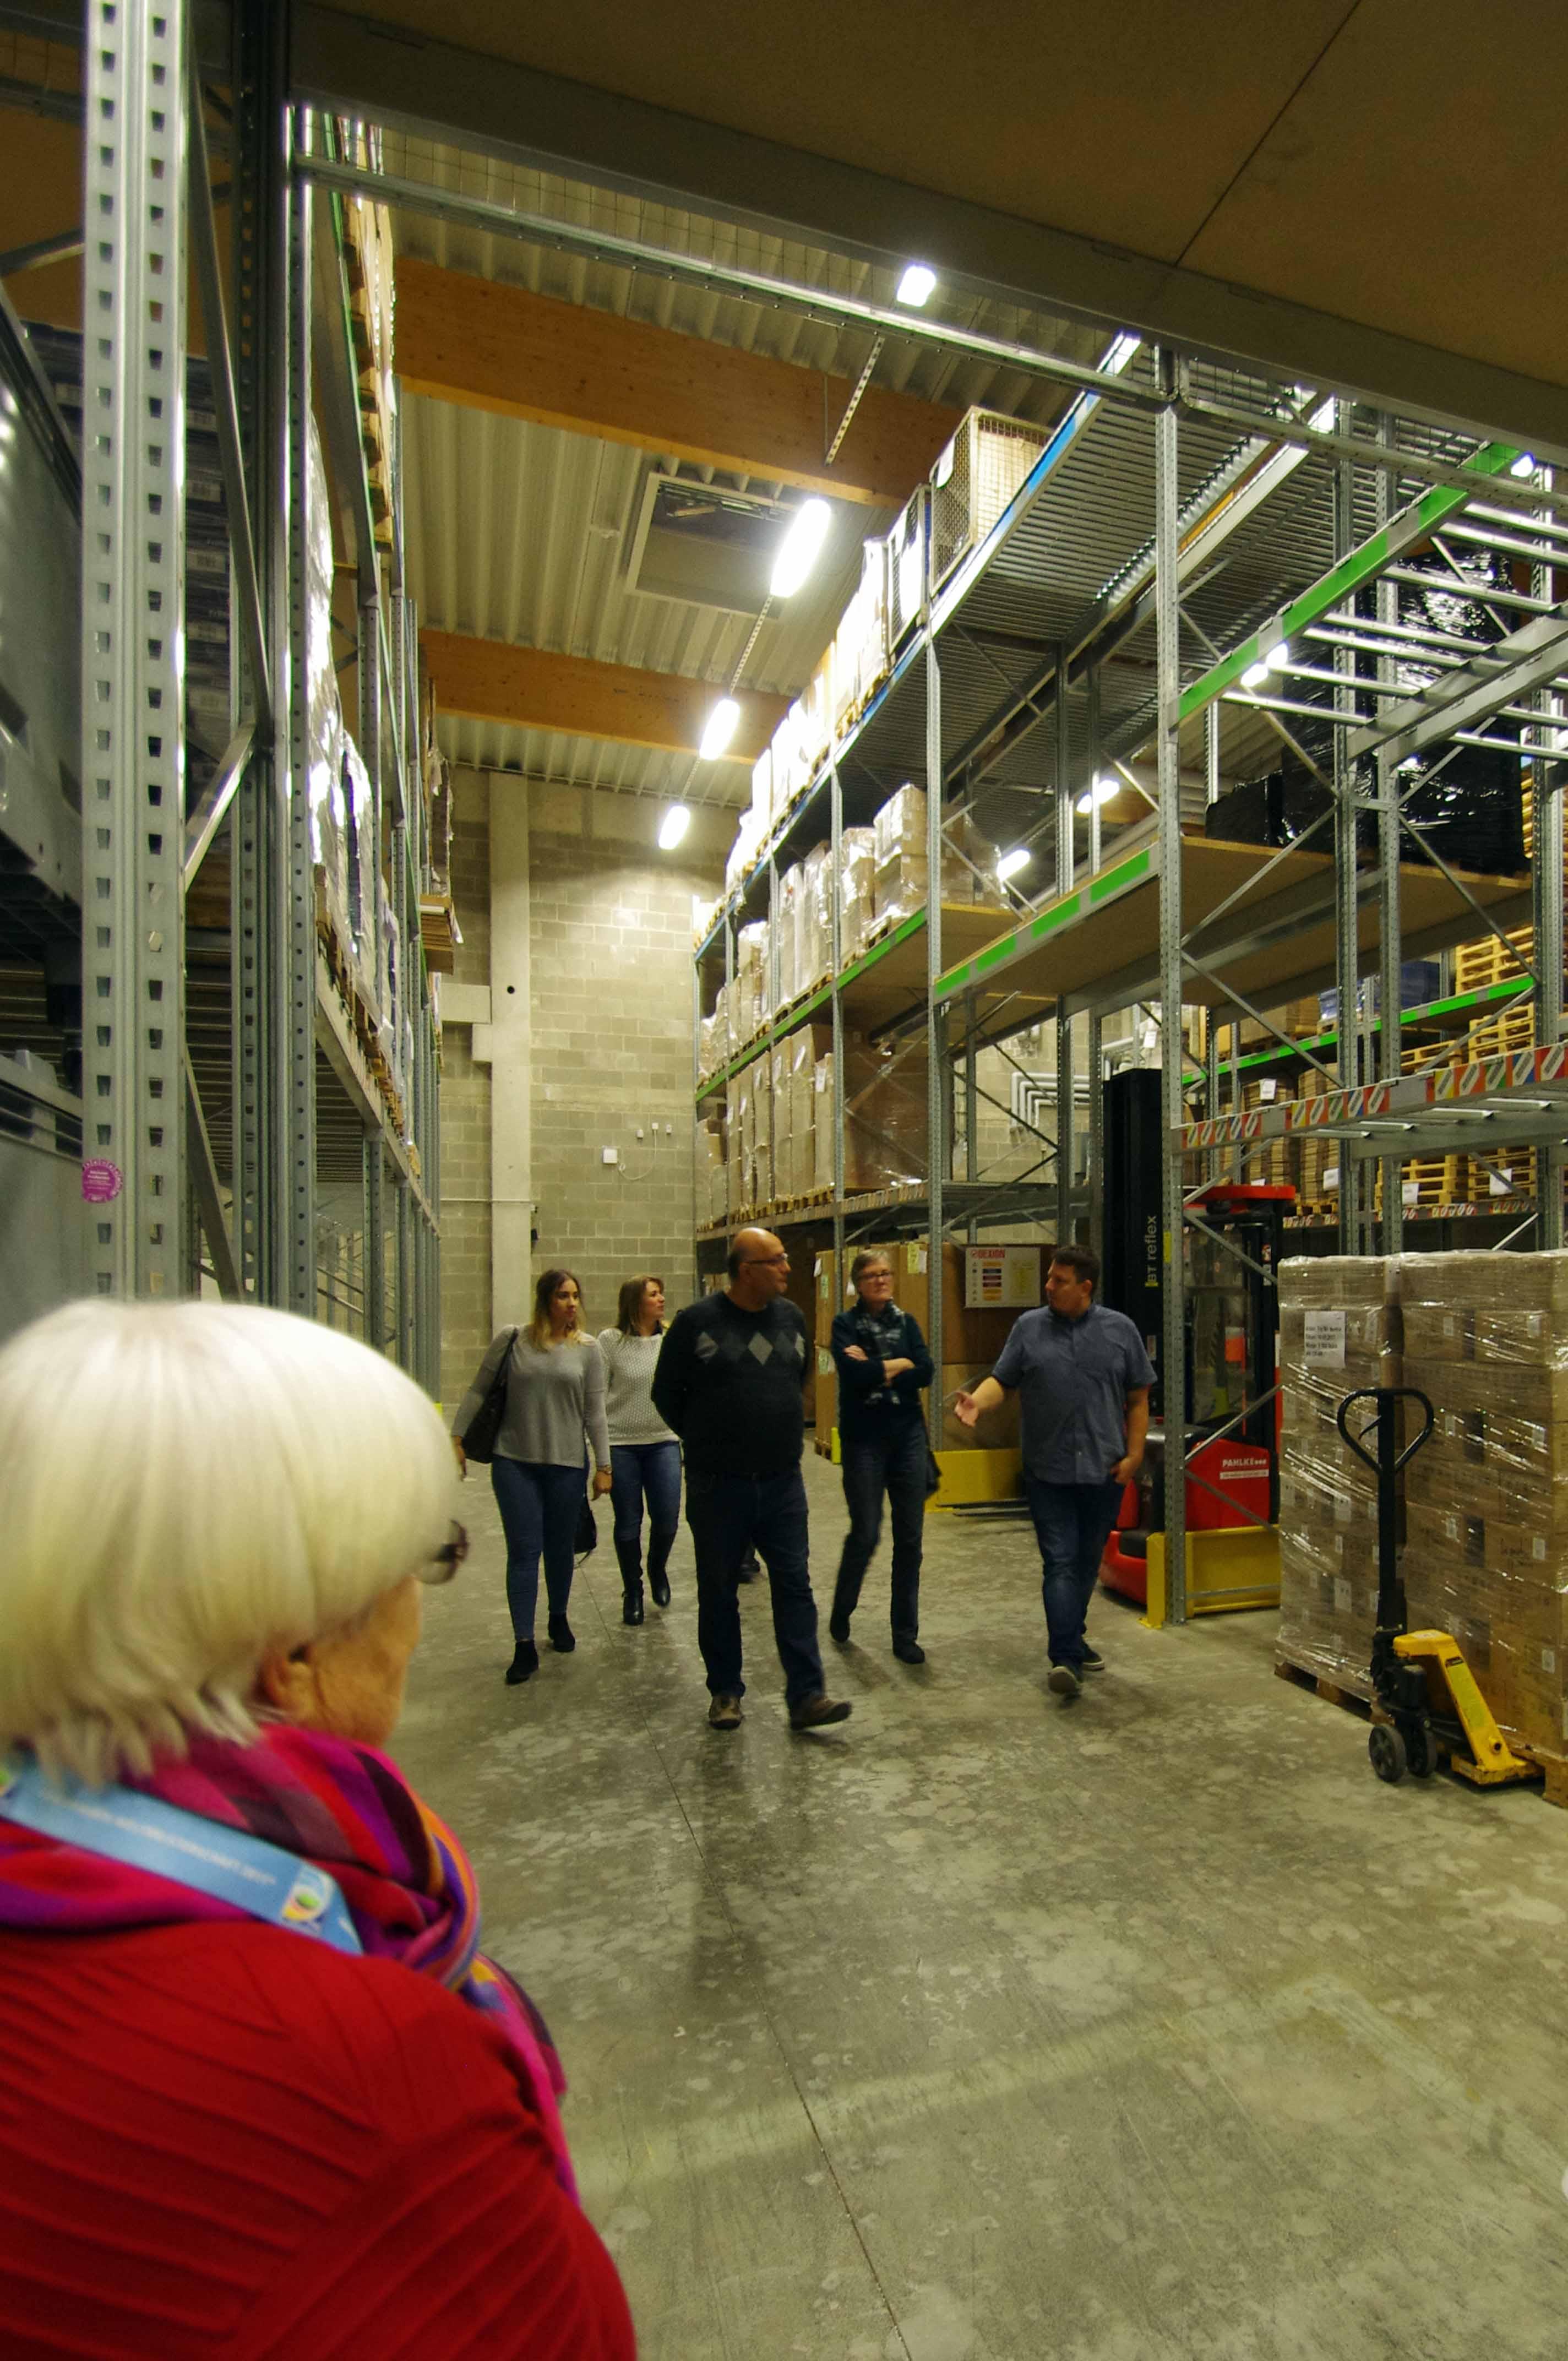 Kiq Dusseldorf Kooperation Im Quartier Soziale Stadt Rath